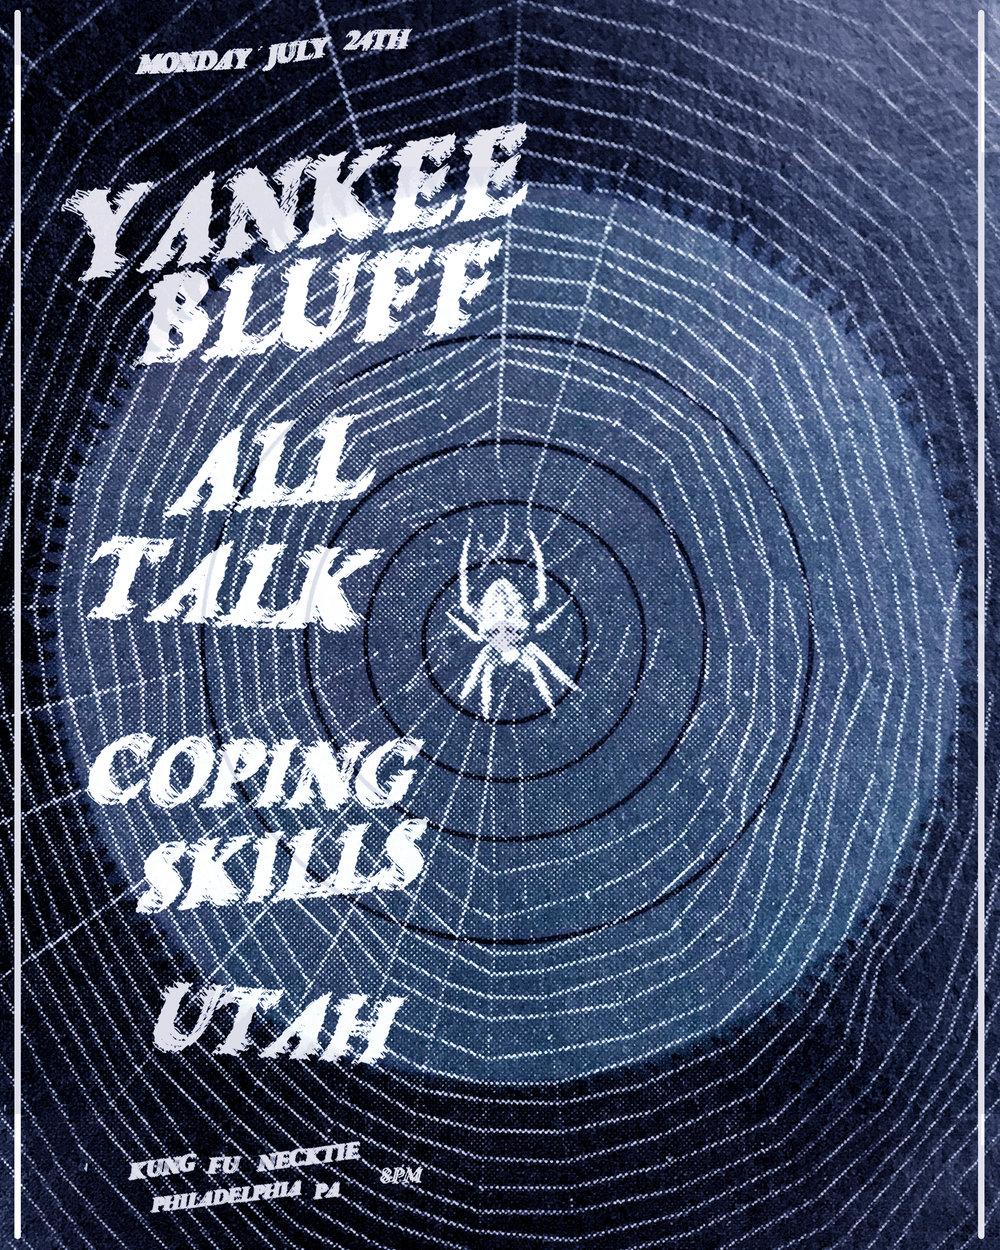 Flyer-YankeeBluff724-Blues copy.jpg